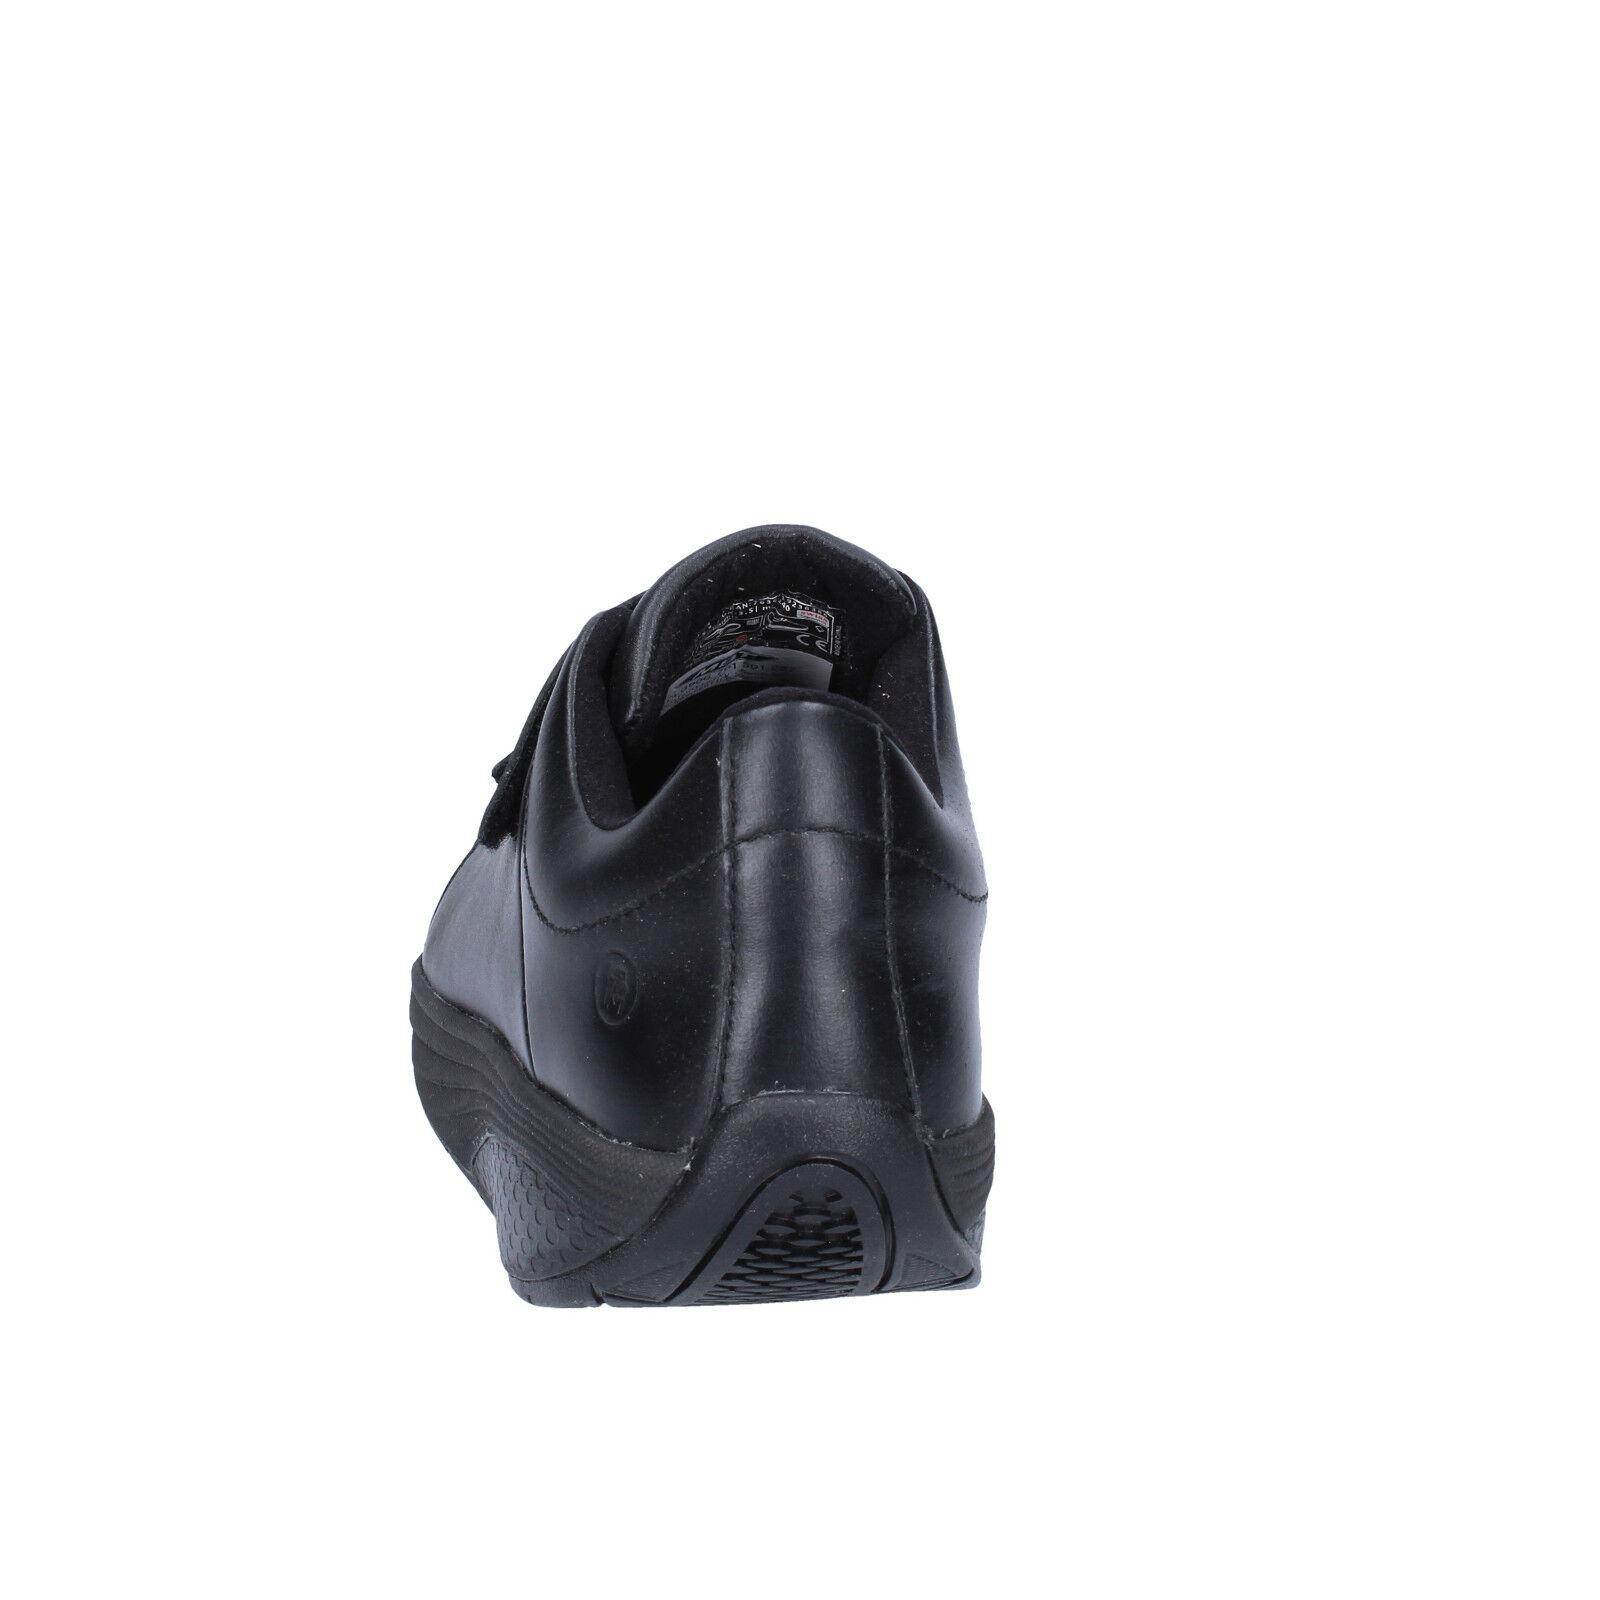 damen schuhe MBT 3,5 (EU 36) Turnschuhe schwarz leather performance performance performance BT192-36 efc536